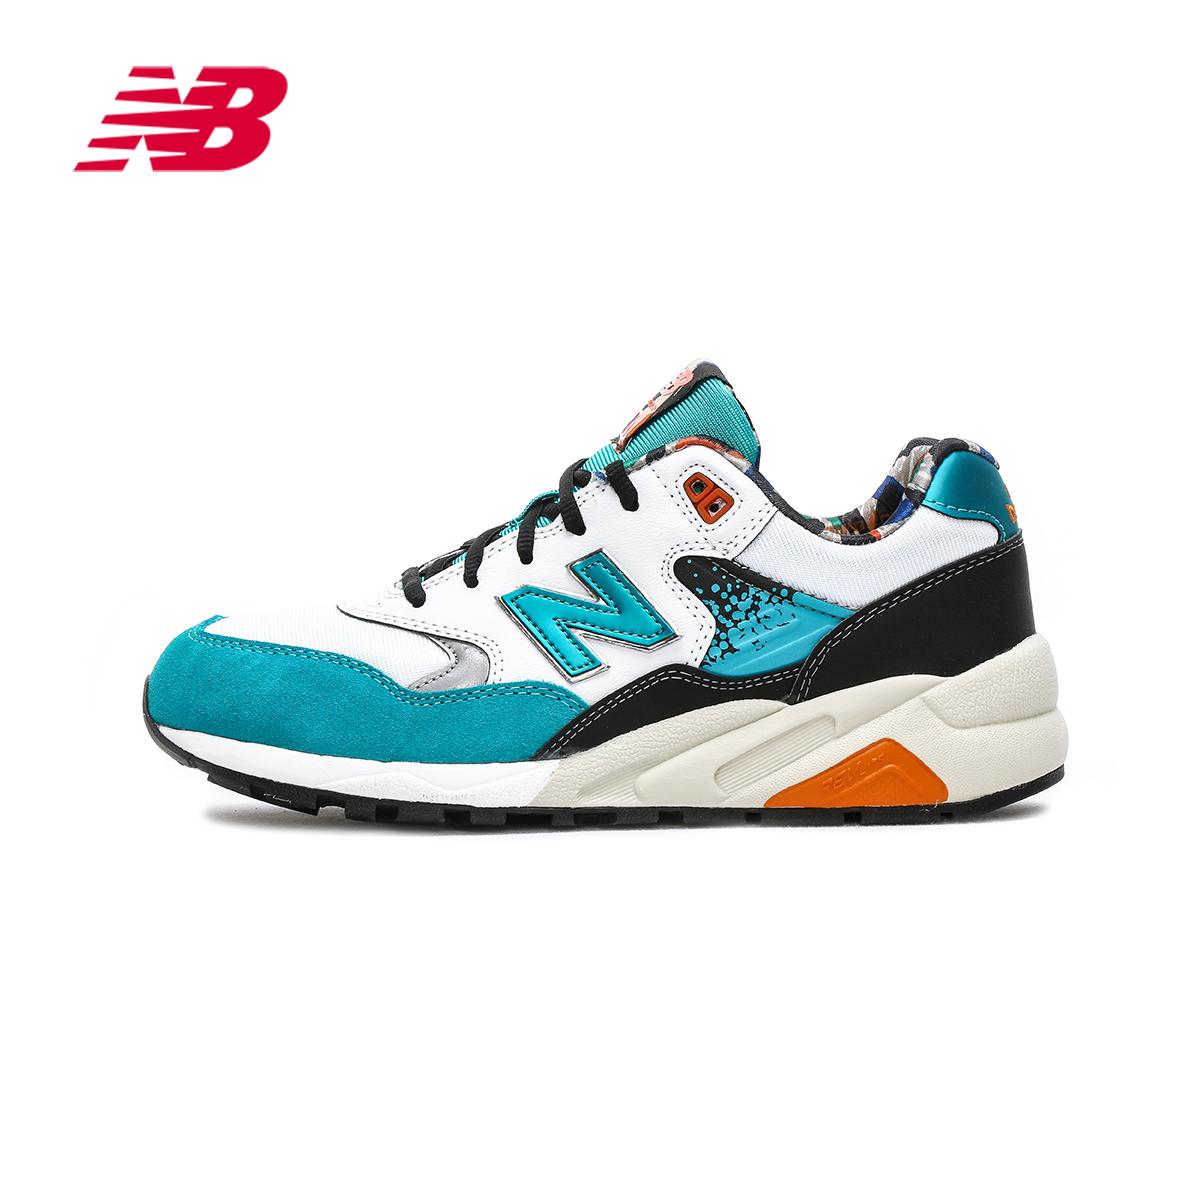 New Balance/NB580系列男鞋女鞋复古跑步鞋运动休闲鞋MRT580HD/HC